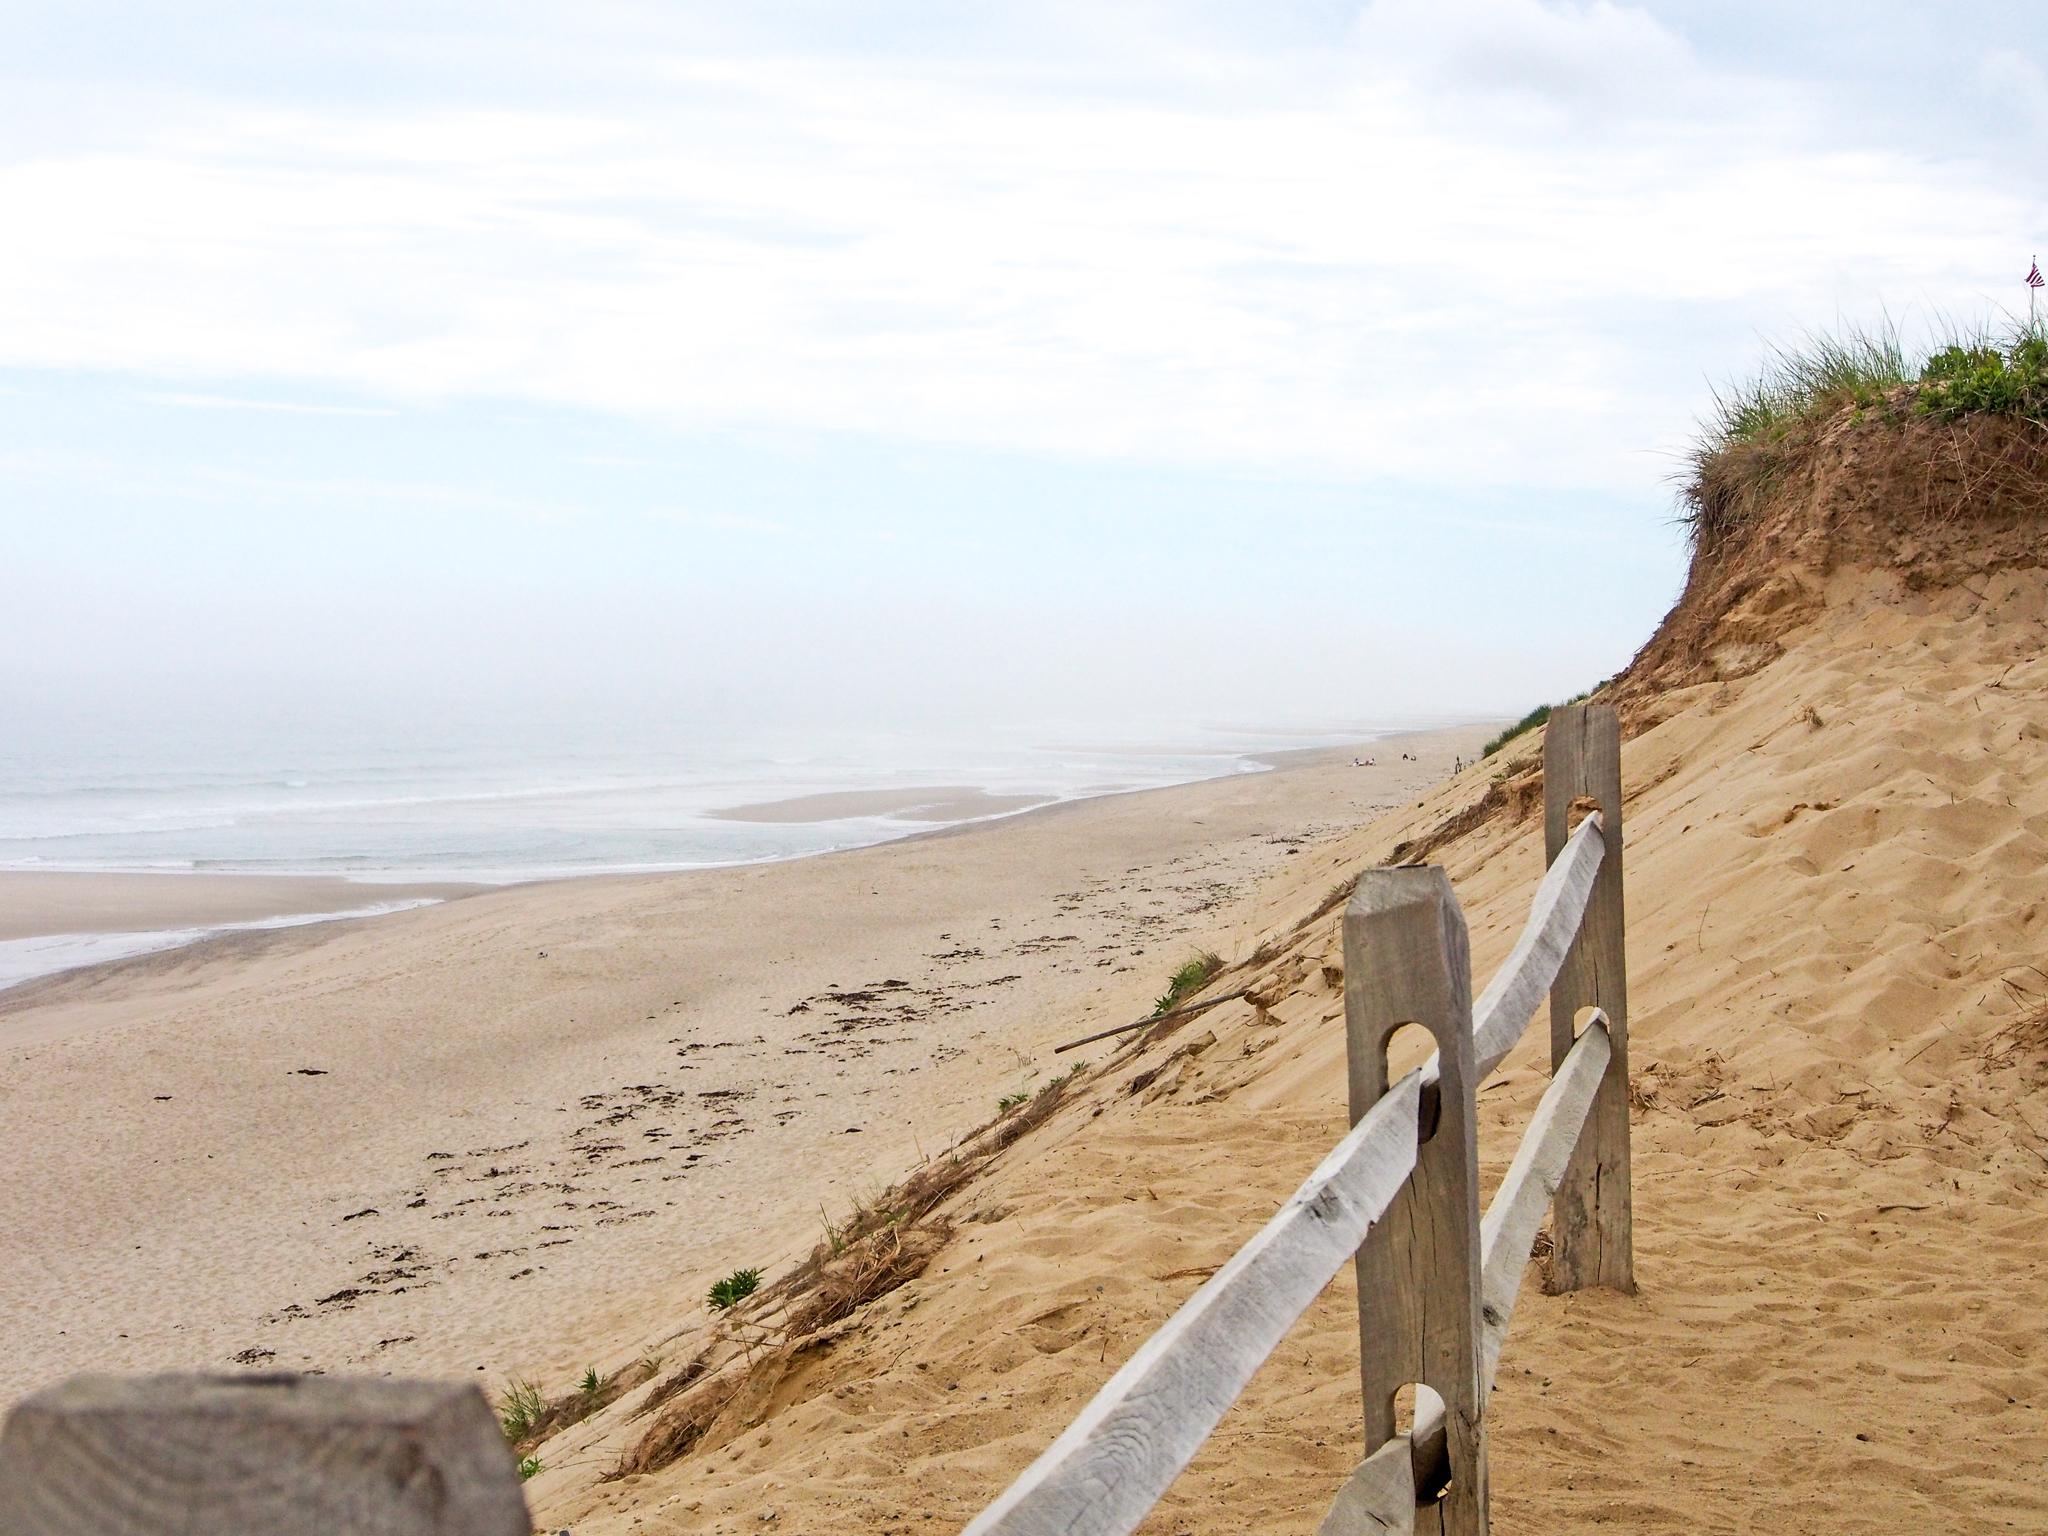 The Beachcomber Beach of Wellfleet.